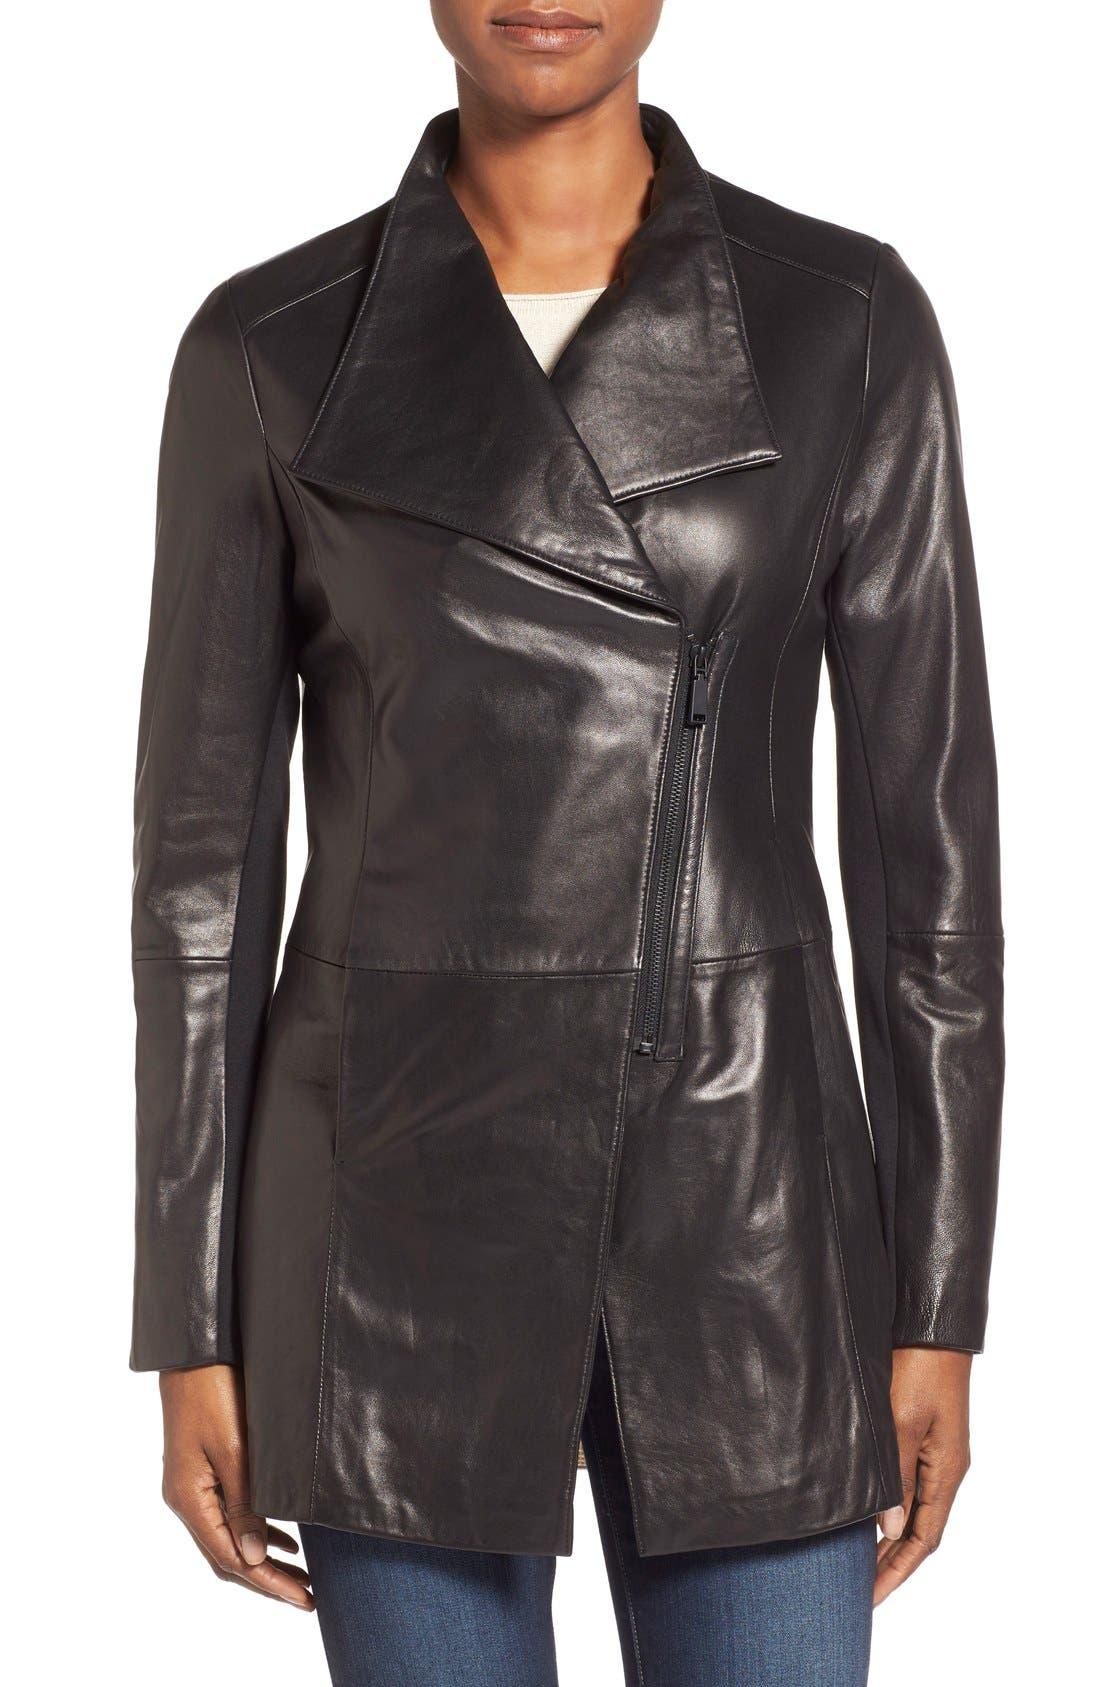 Alternate Image 1 Selected - ElieTahari'Claire' AsymmetricalCutaway Leather Coat